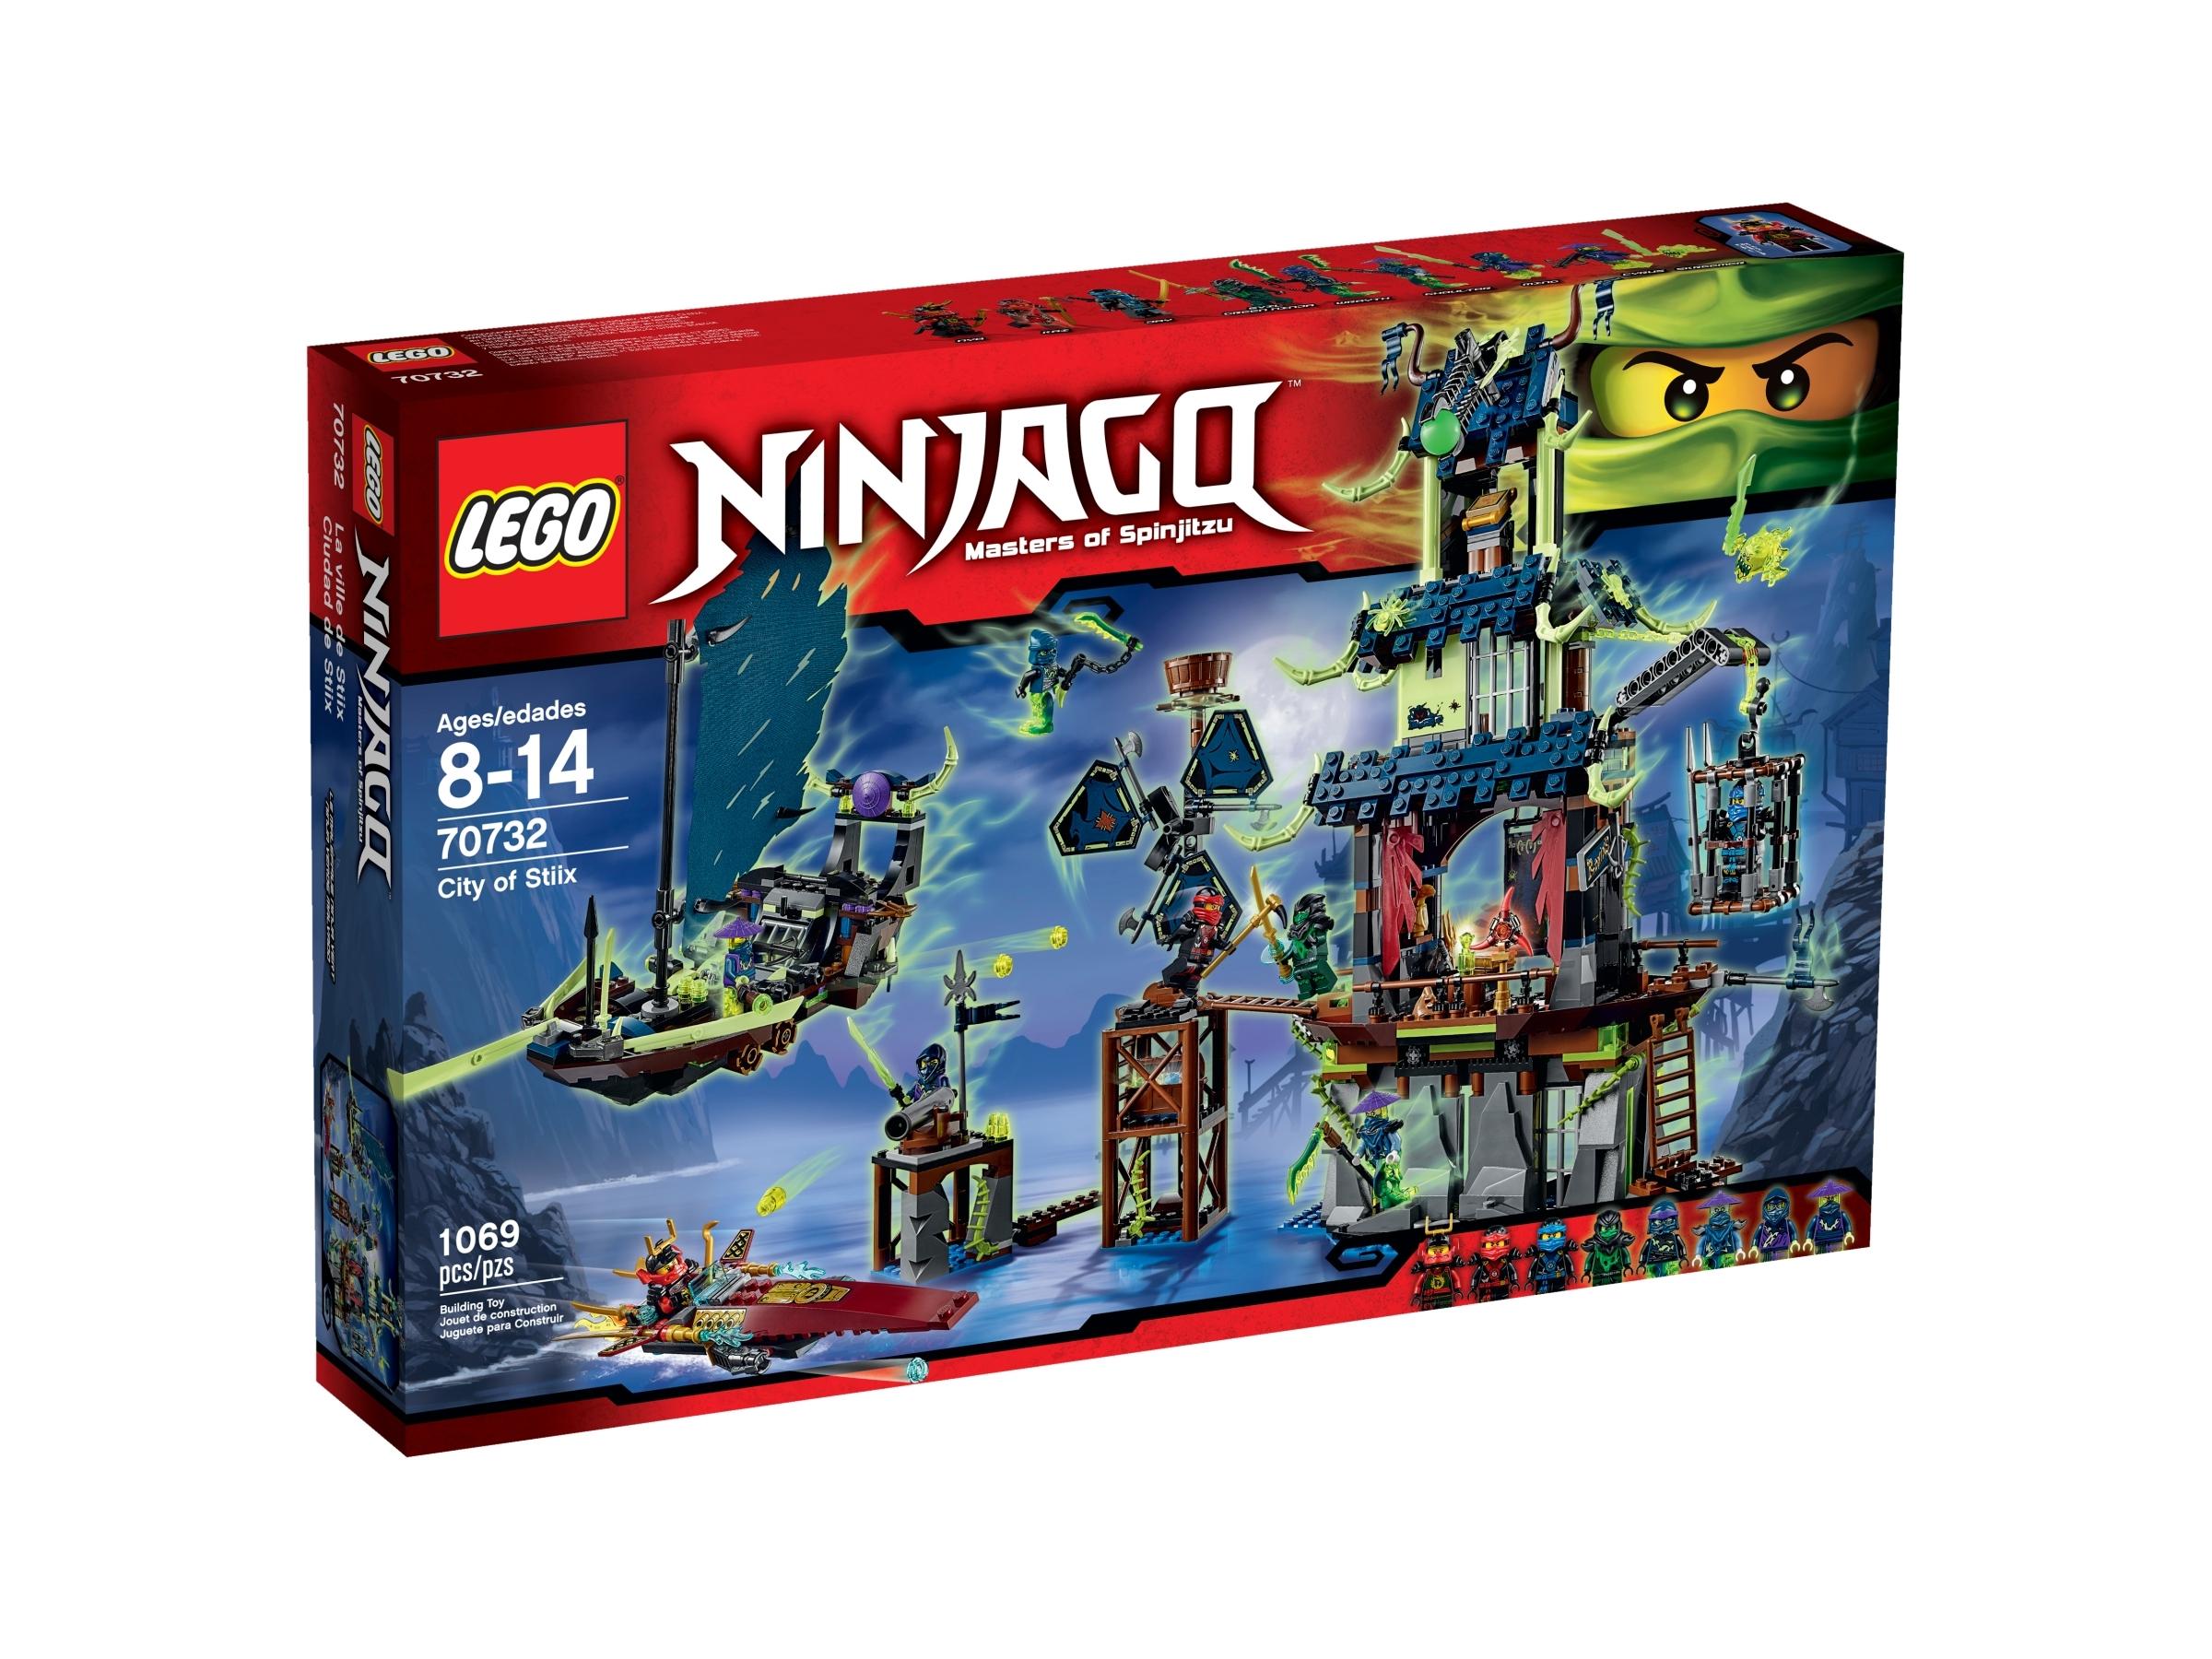 Lego Ninjago Ghost Ninja Ming w// Weapon from 70732 City of Stiix